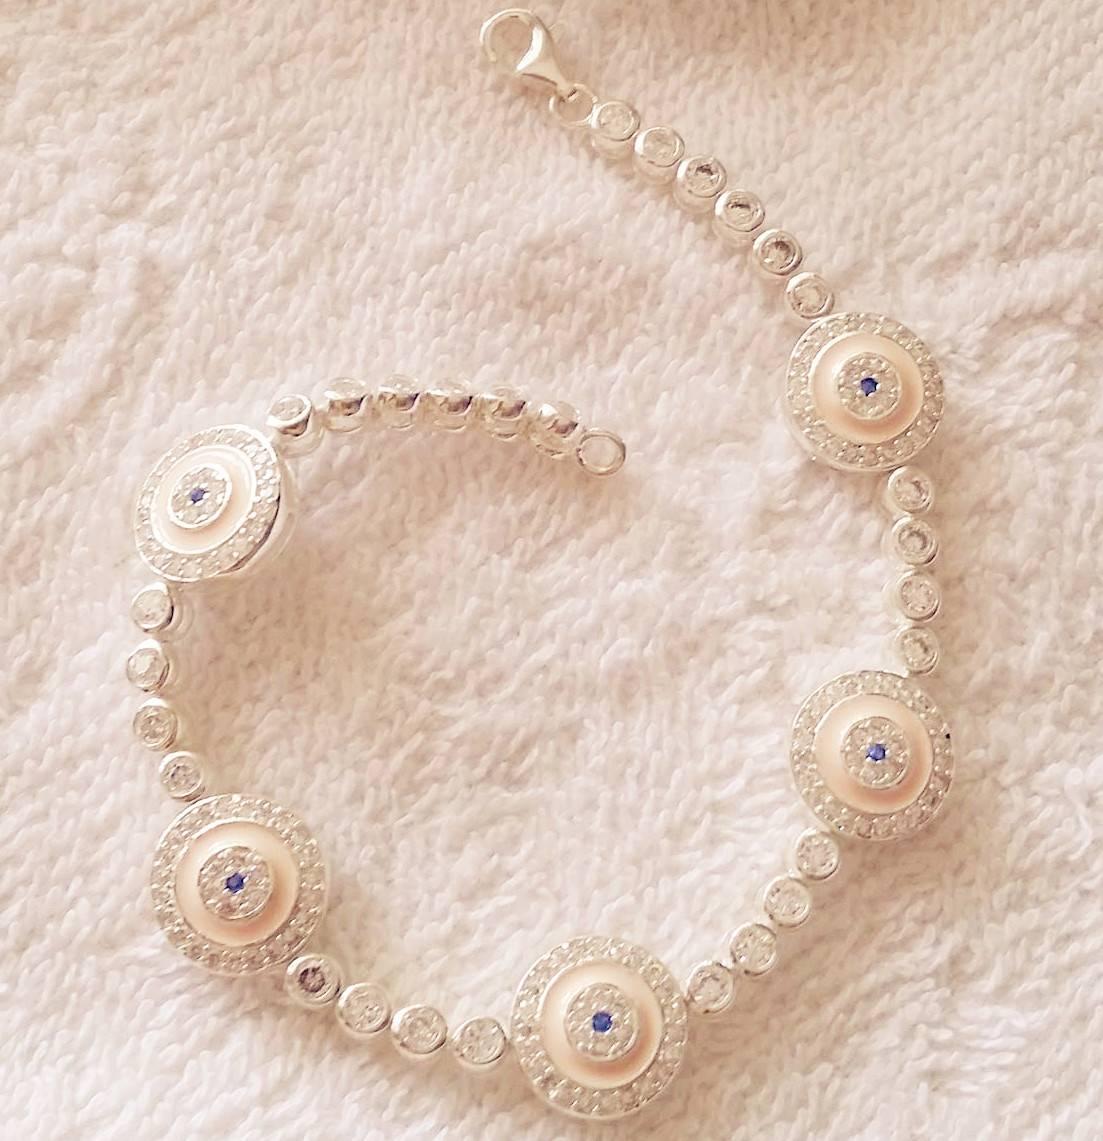 925 silver cubic zircon pink evil eye bracelet